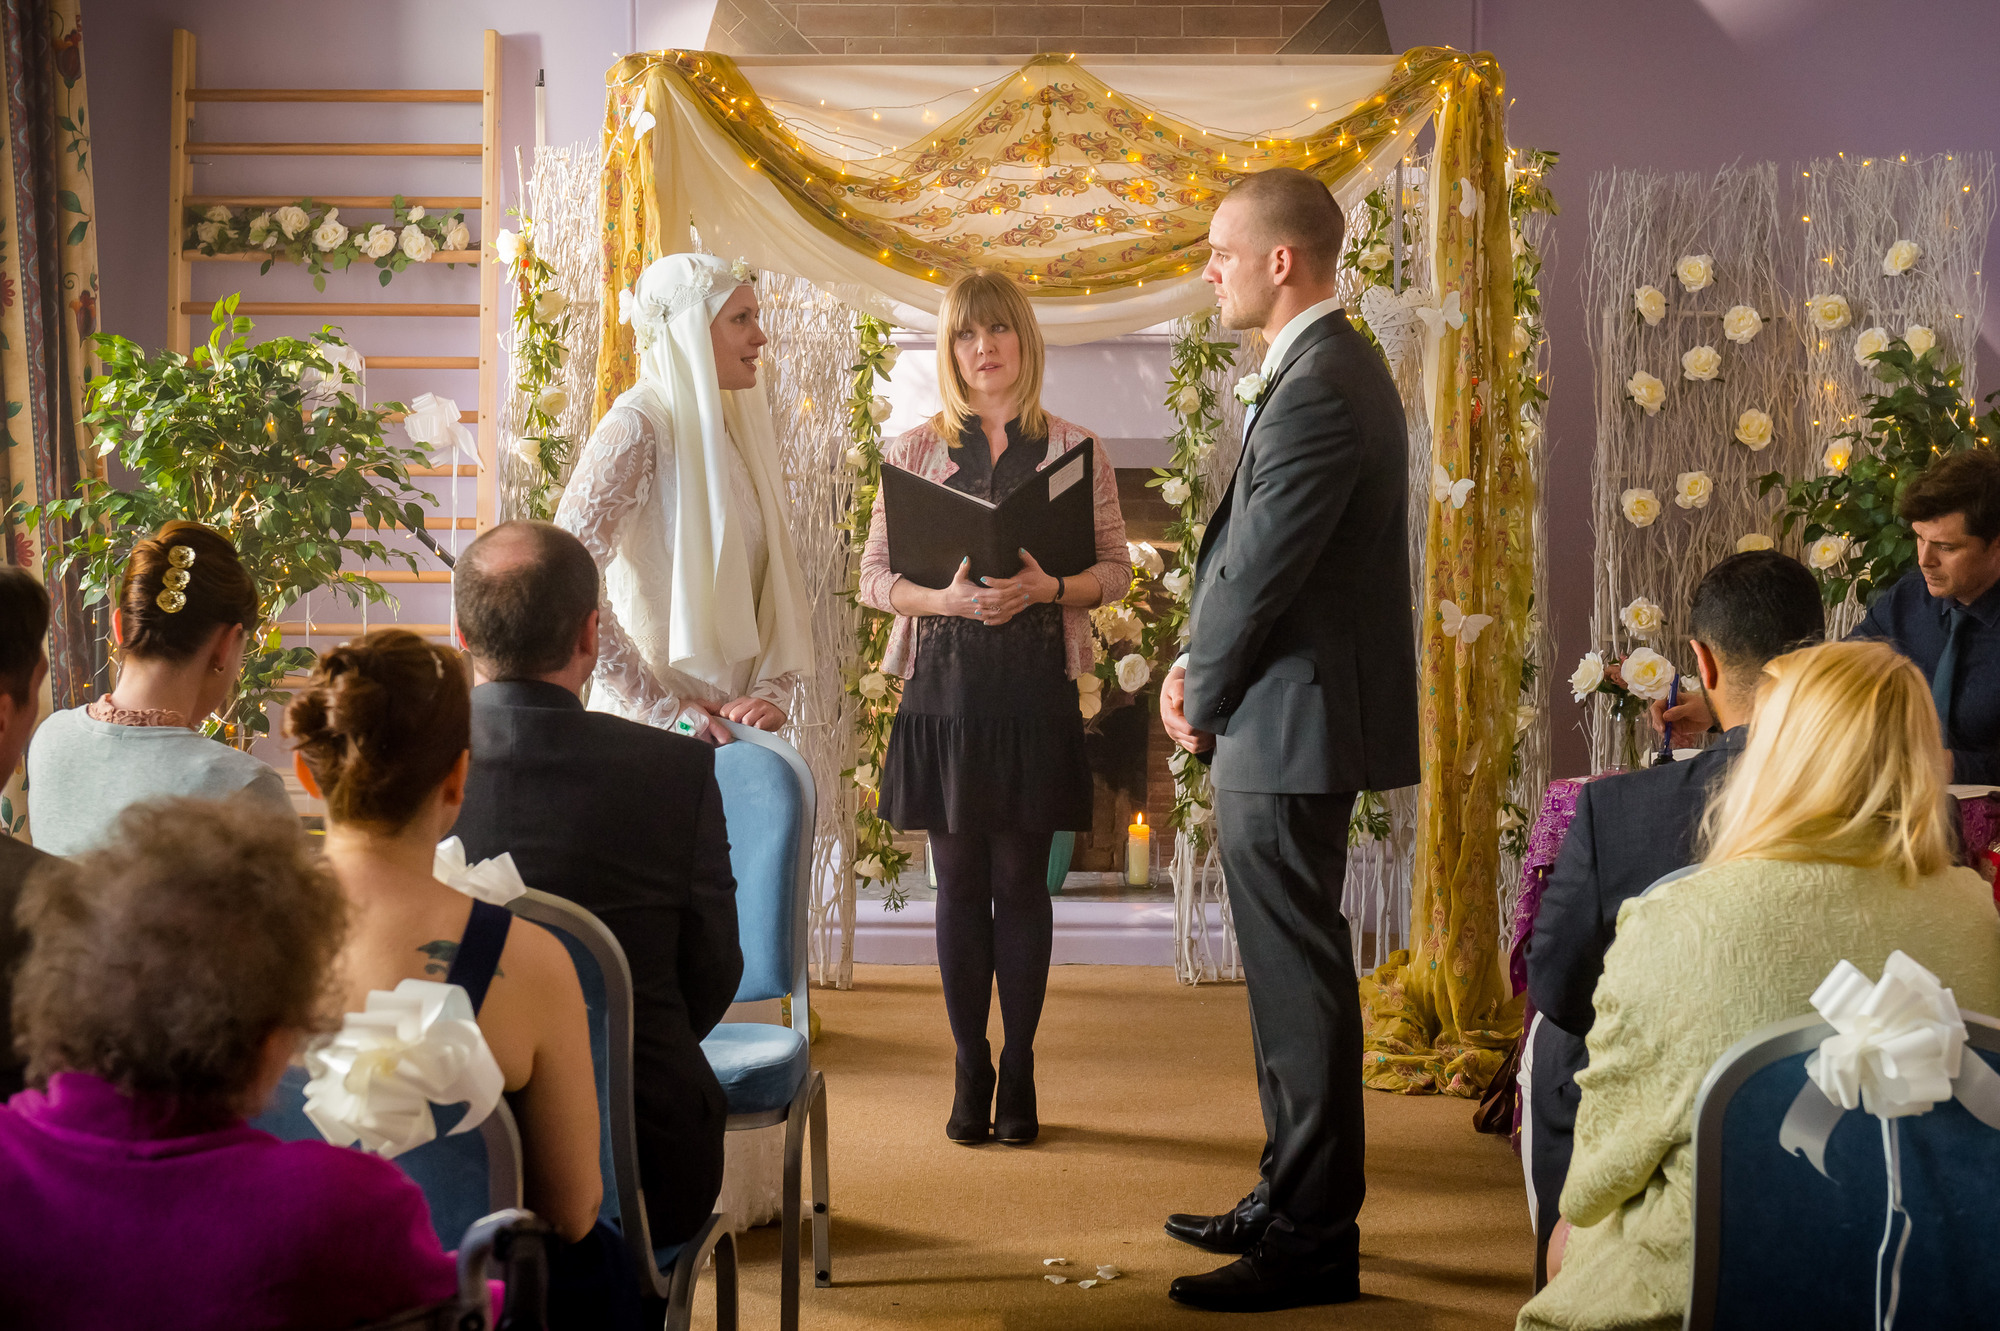 Programme Name: Love, Lies & Records - TX: n/a - Episode: n/a (No. 1) - Picture Shows: L-R Jenny (HANNAH STEELE), Kate (ASHLEY JENSEN) - (C) Rollem Productions - Photographer: Ben Blackall